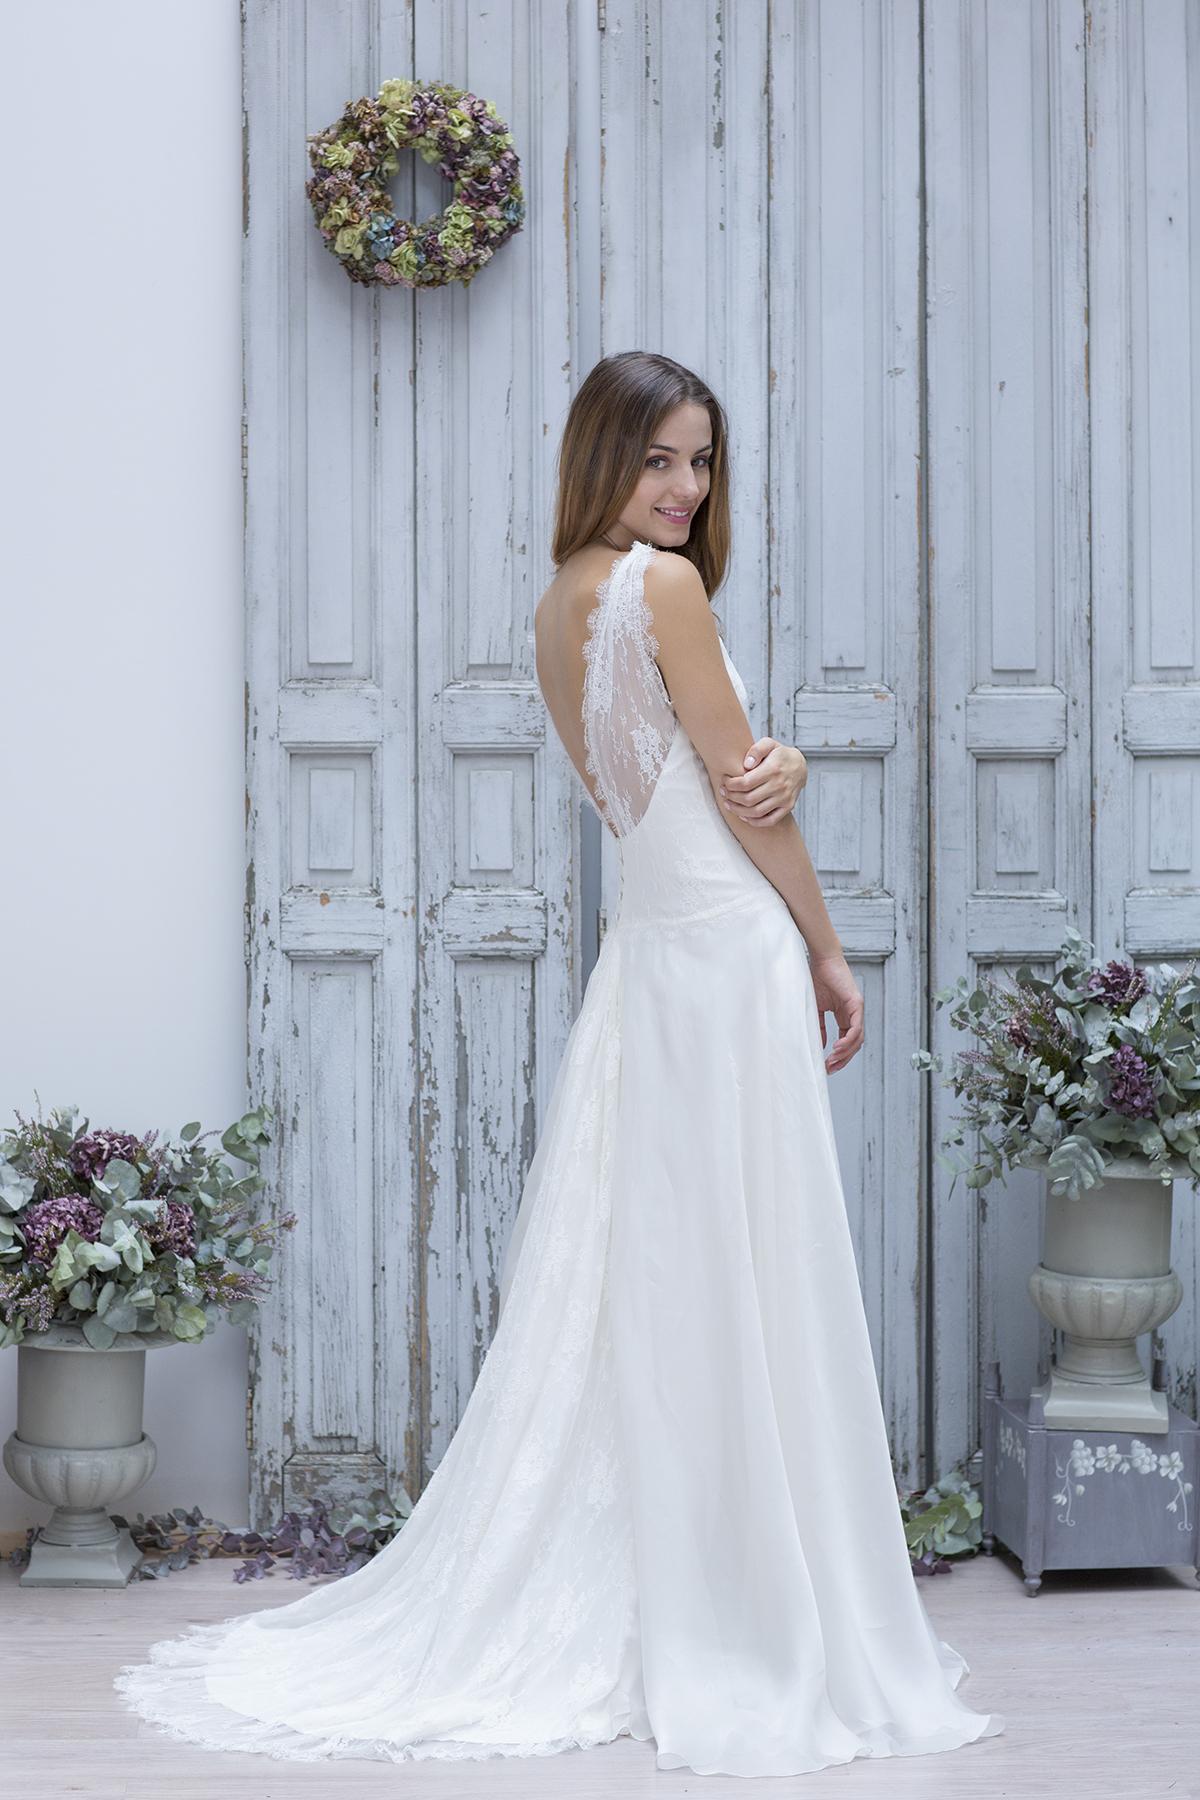 Fabuleux Robe de Mariée : Marie Laporte 2014 TE87